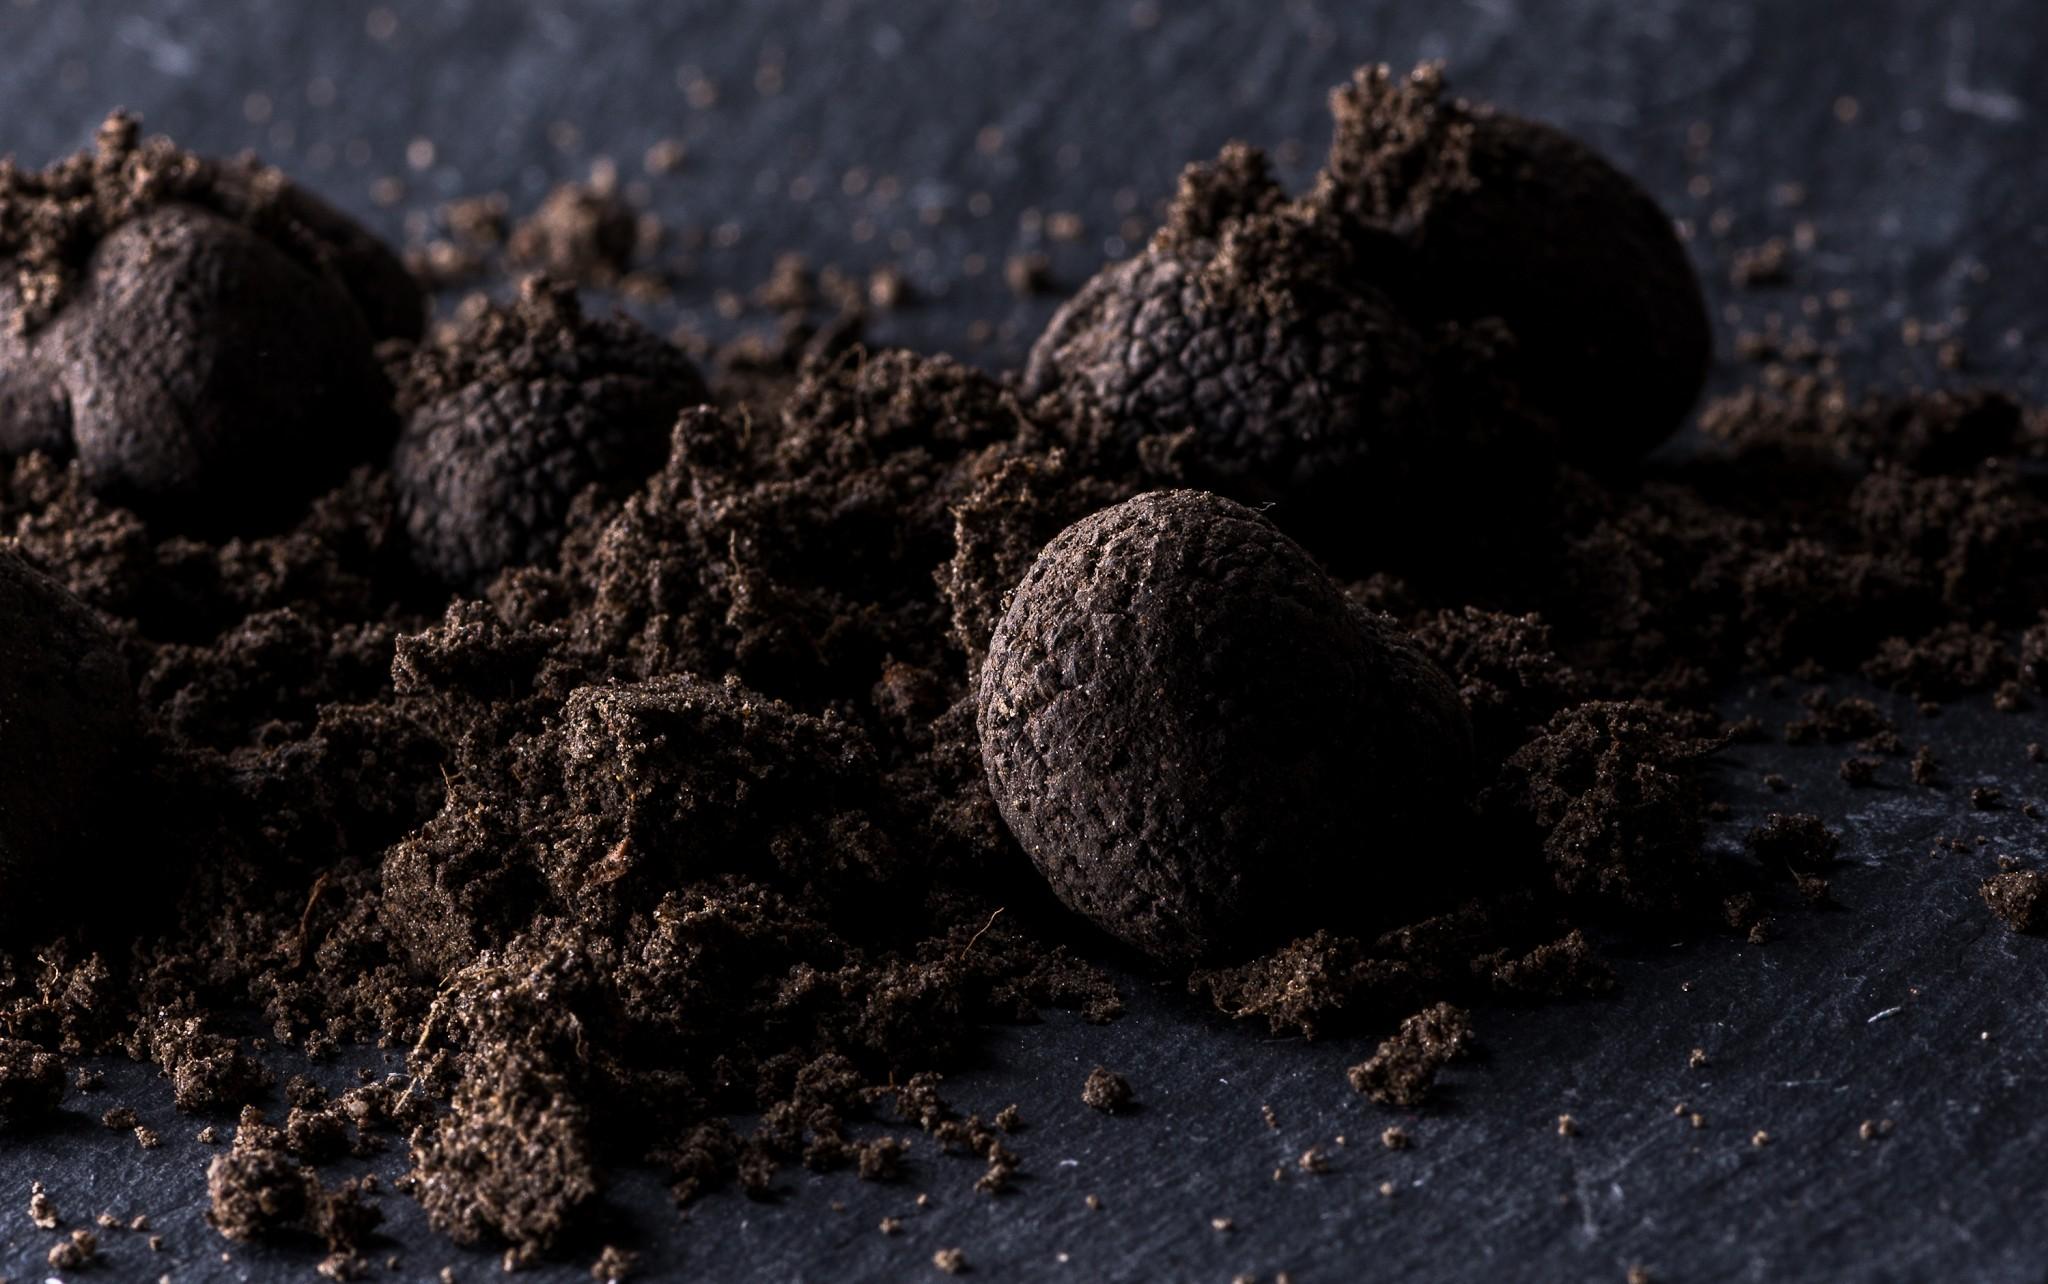 Trufo Shop - The future of truffles